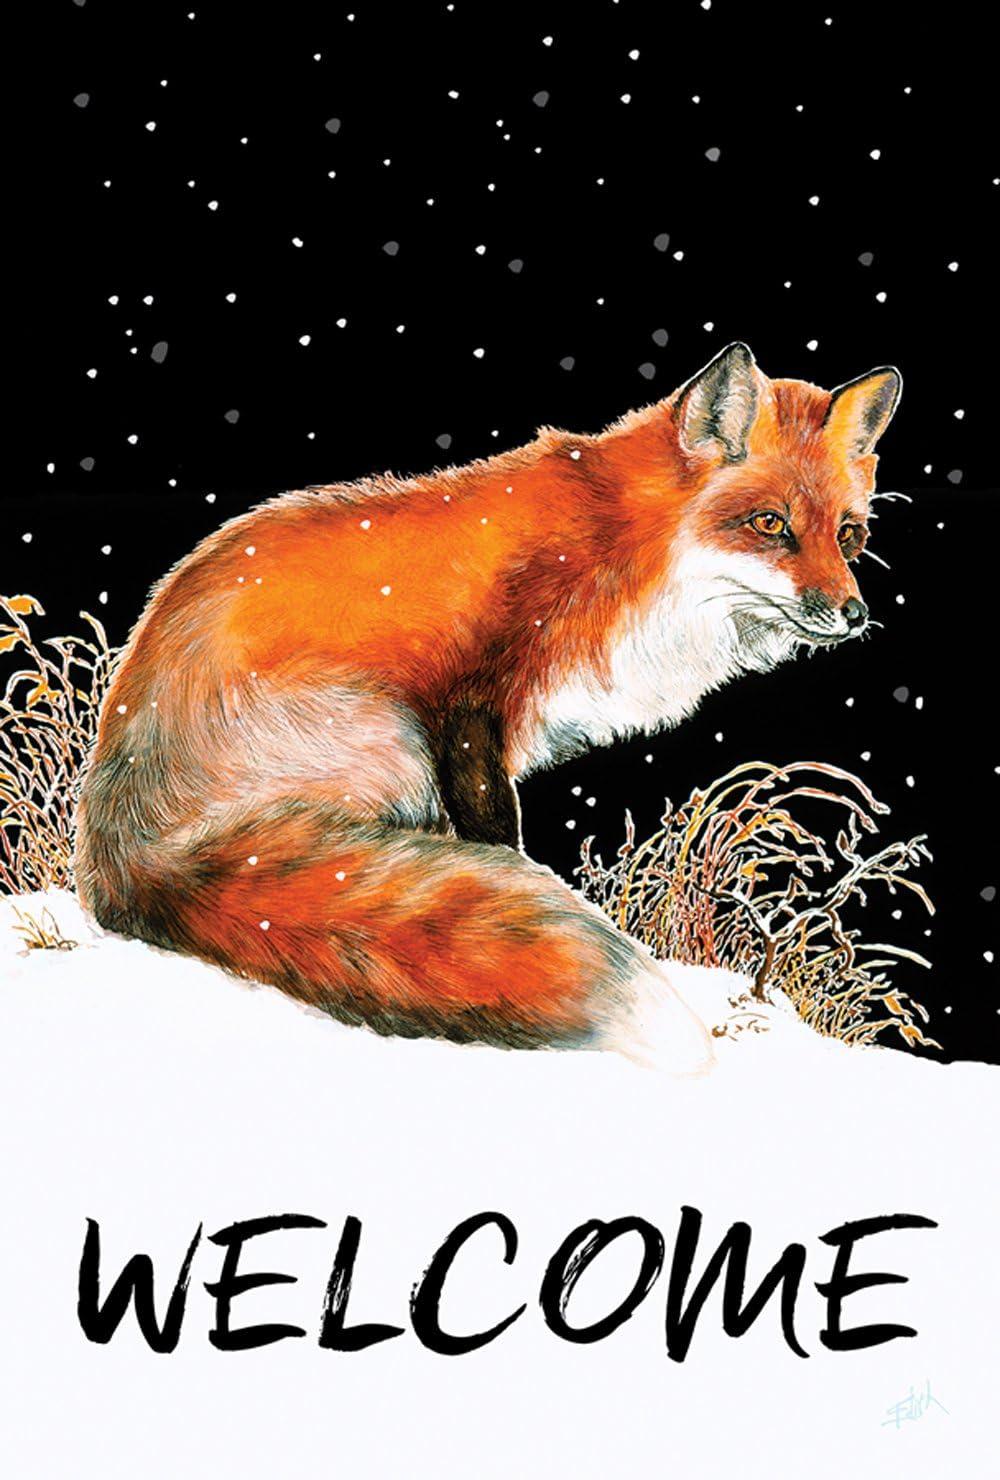 Toland Home Garden Winter Welcome Fox 12.5 x 18 Inch Decorative Snow Animal Garden Flag